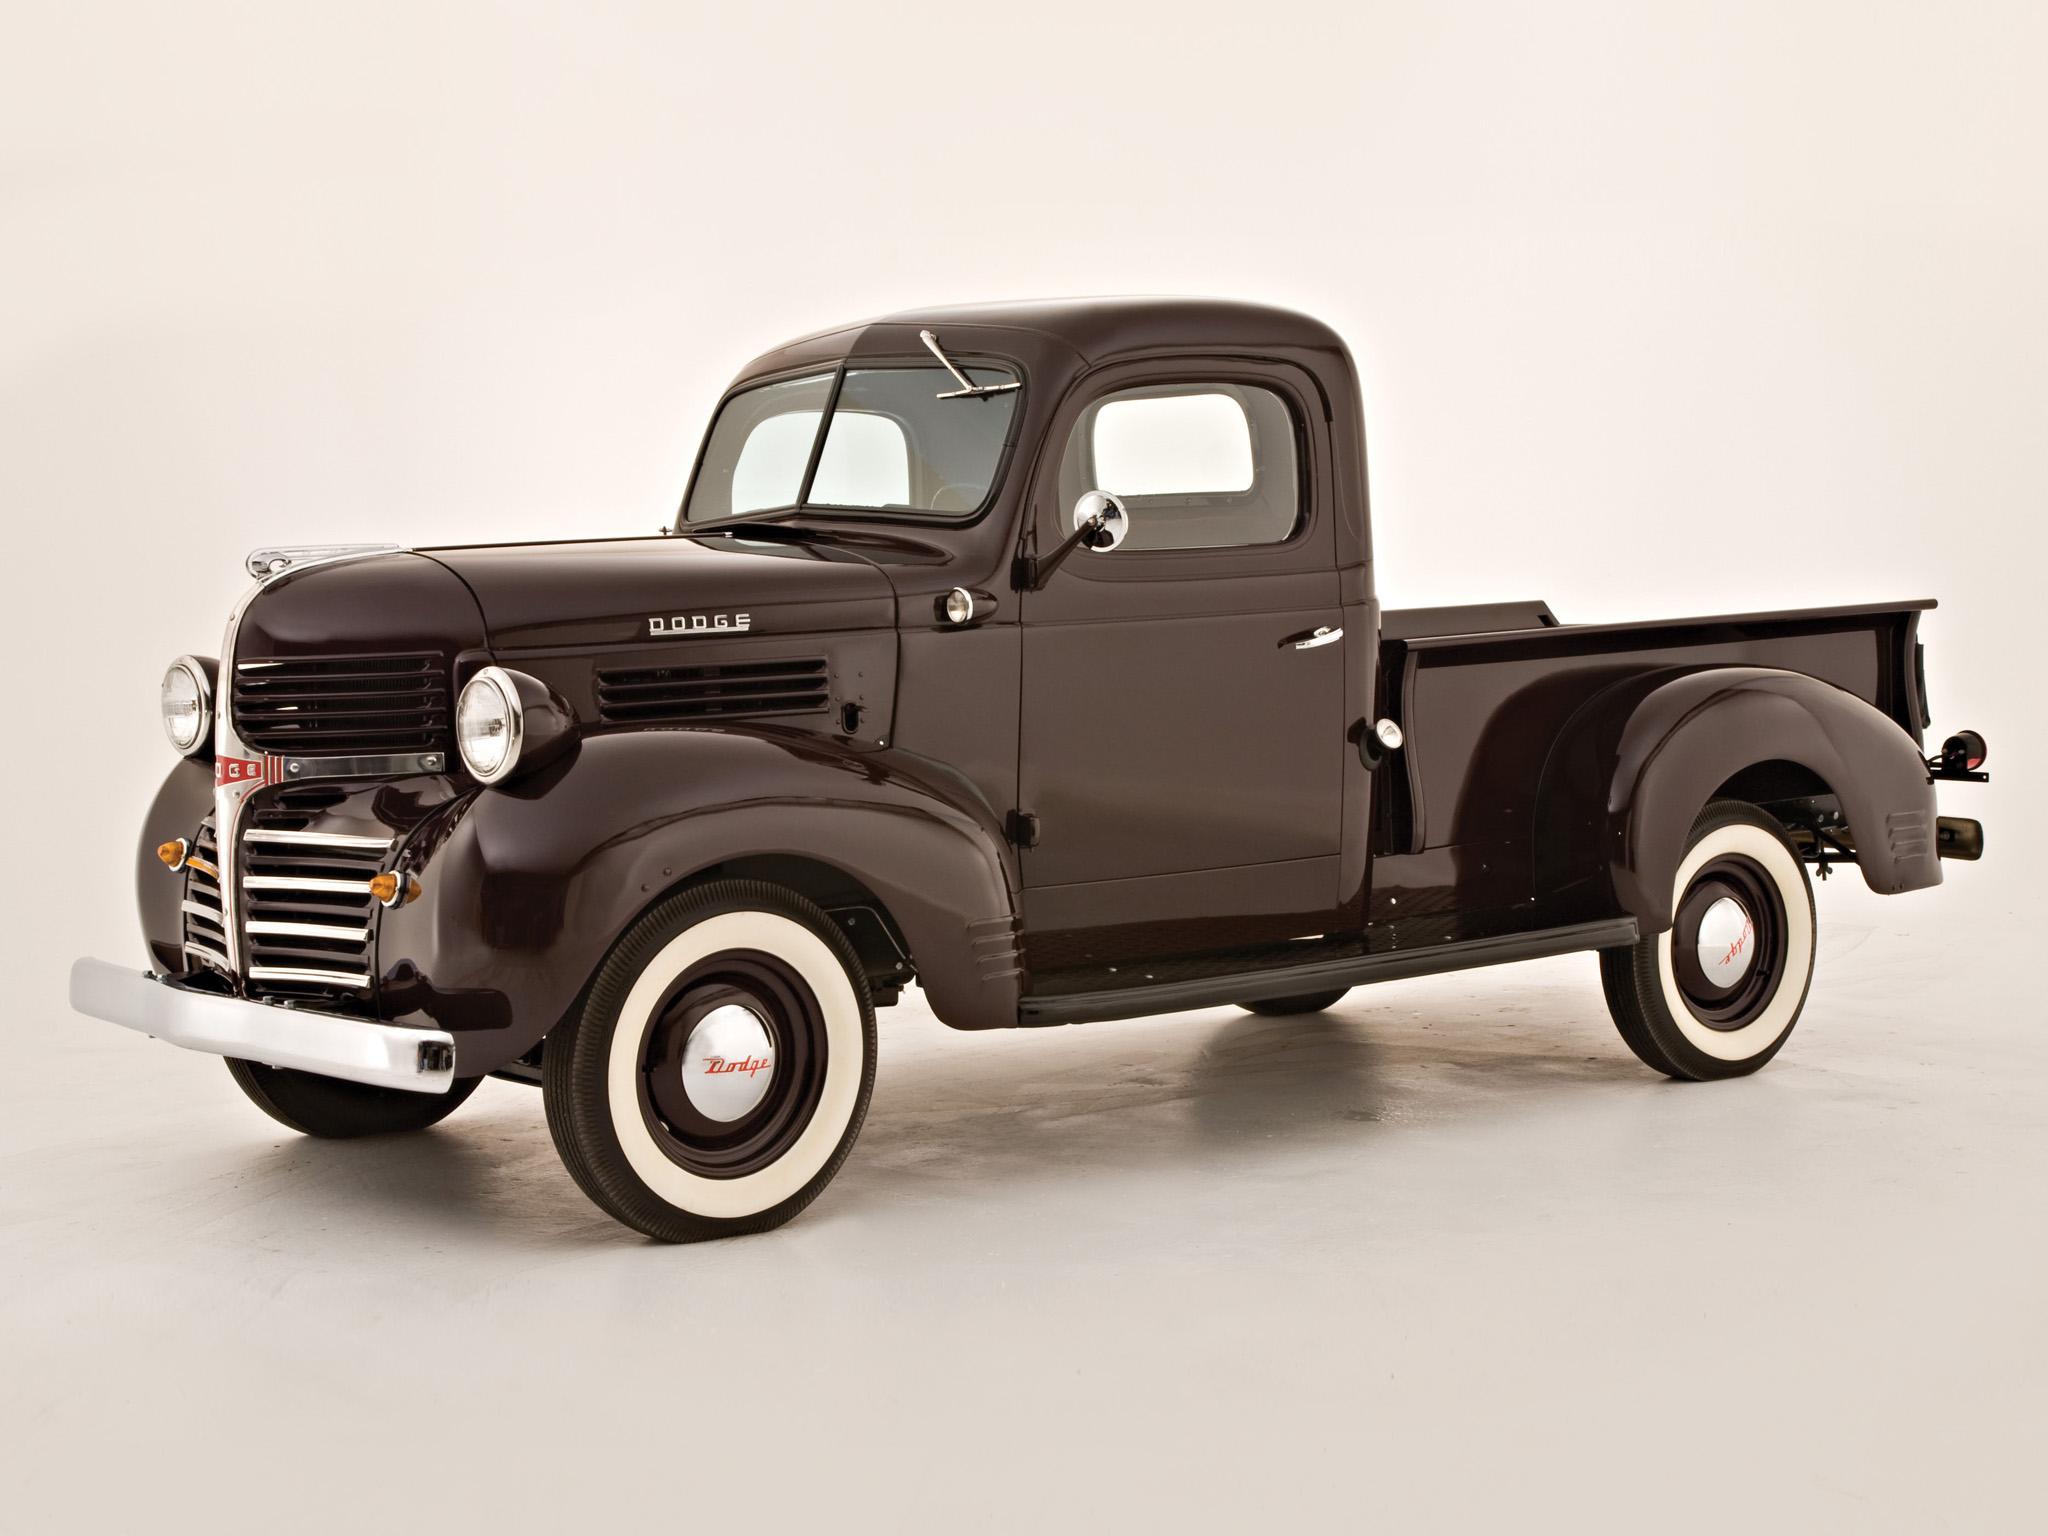 1941 Dodge Job-Rated